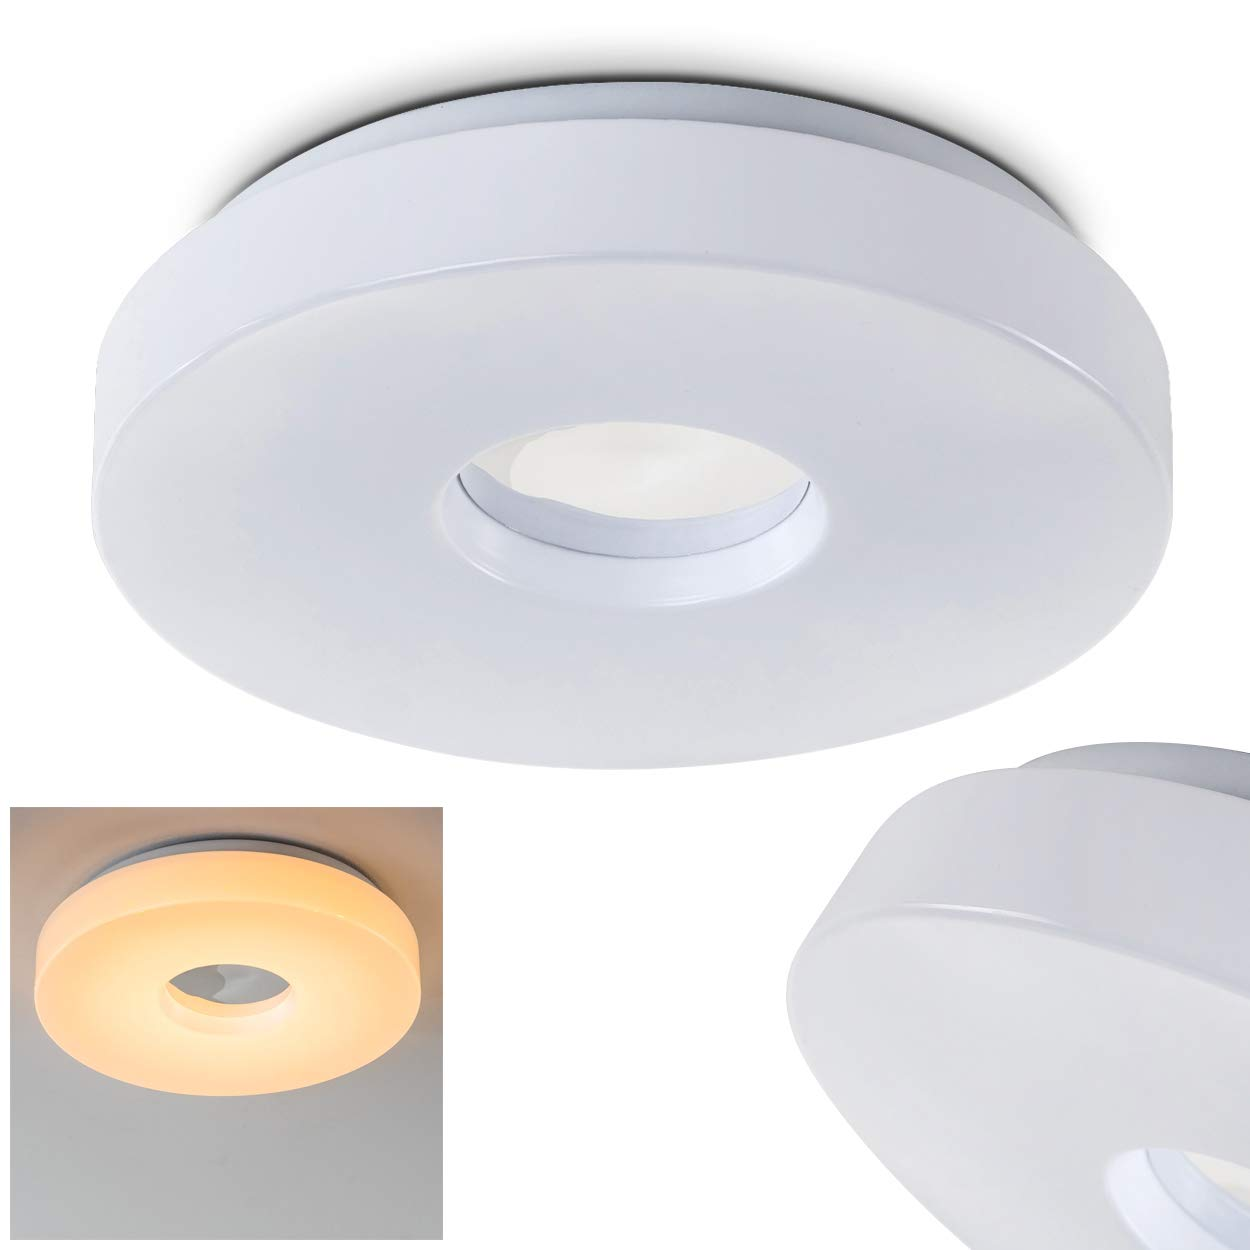 Led round ceiling light 12 watt beautiful circular shaped even glow ip 44 modern design ceiling lamp 3000 kelvin white for indoor outdoor bathroom